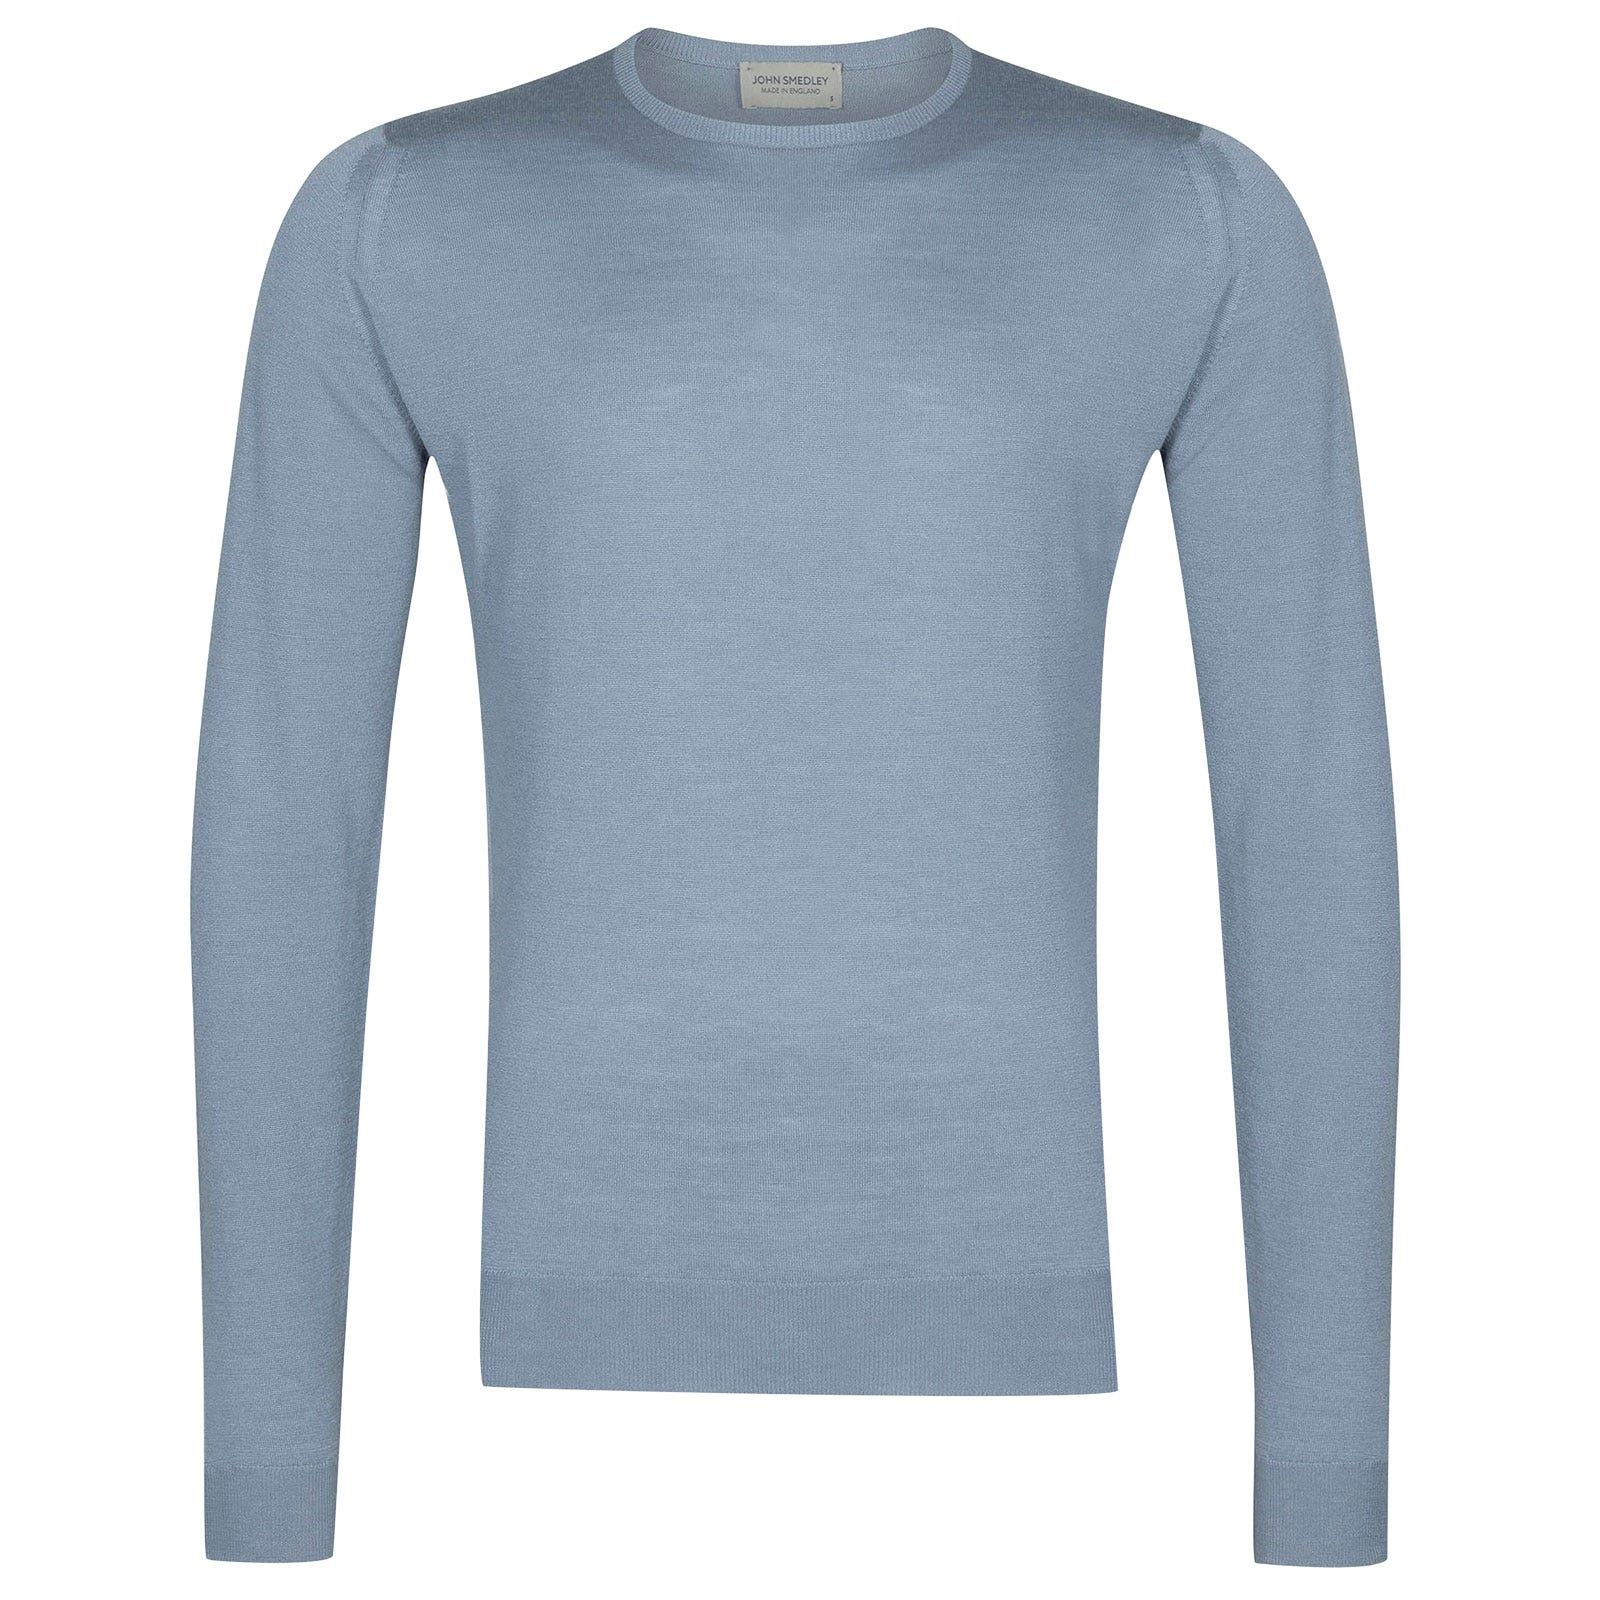 John Smedley Lundy in Dusk Blue Pullover-XXL